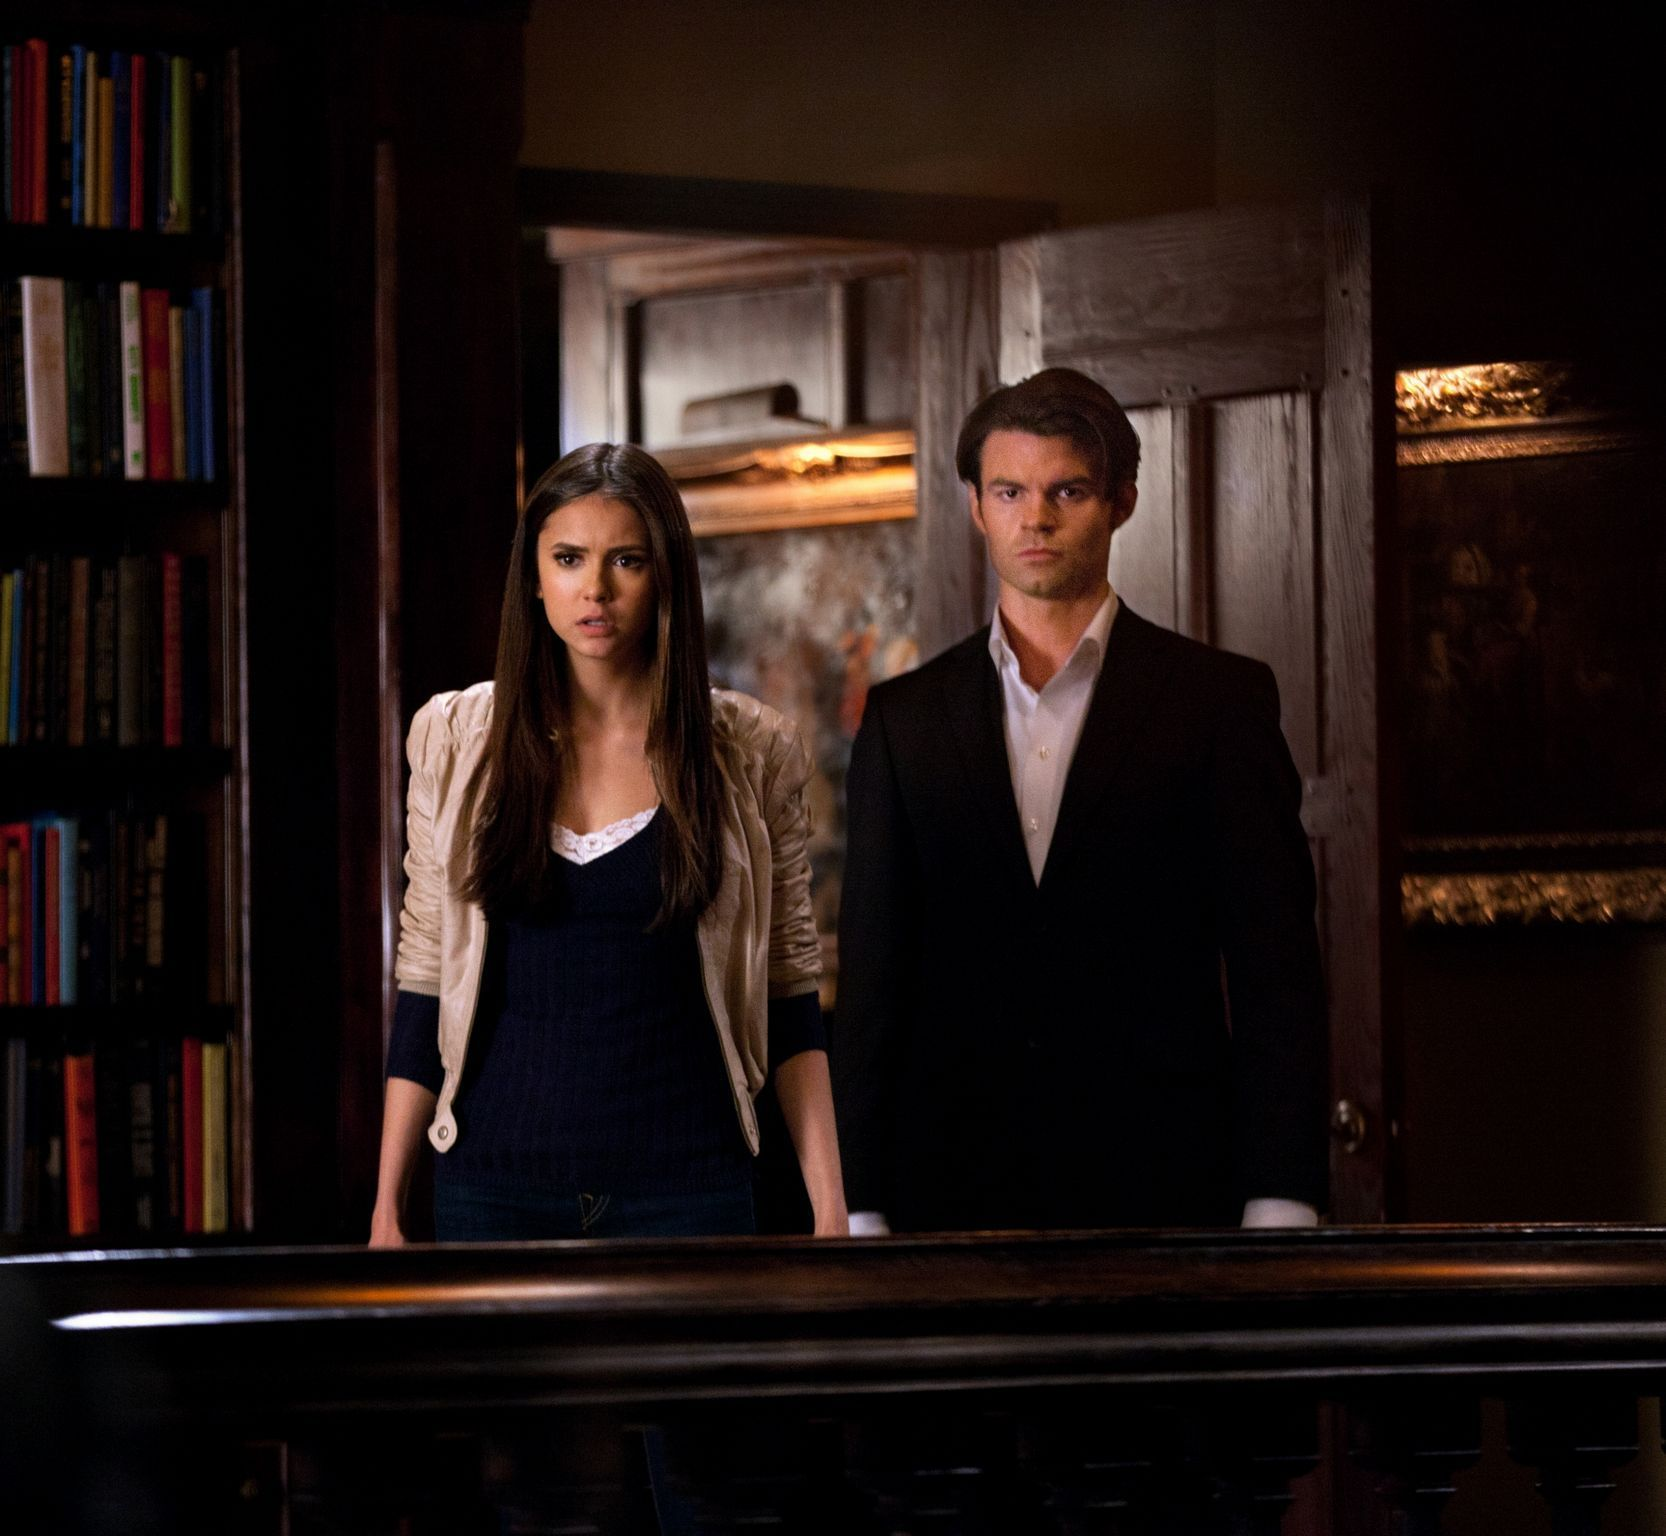 elena-elijah-2x19-the-vampire-diaries-tv-show-21076997-1666-1536.jpg